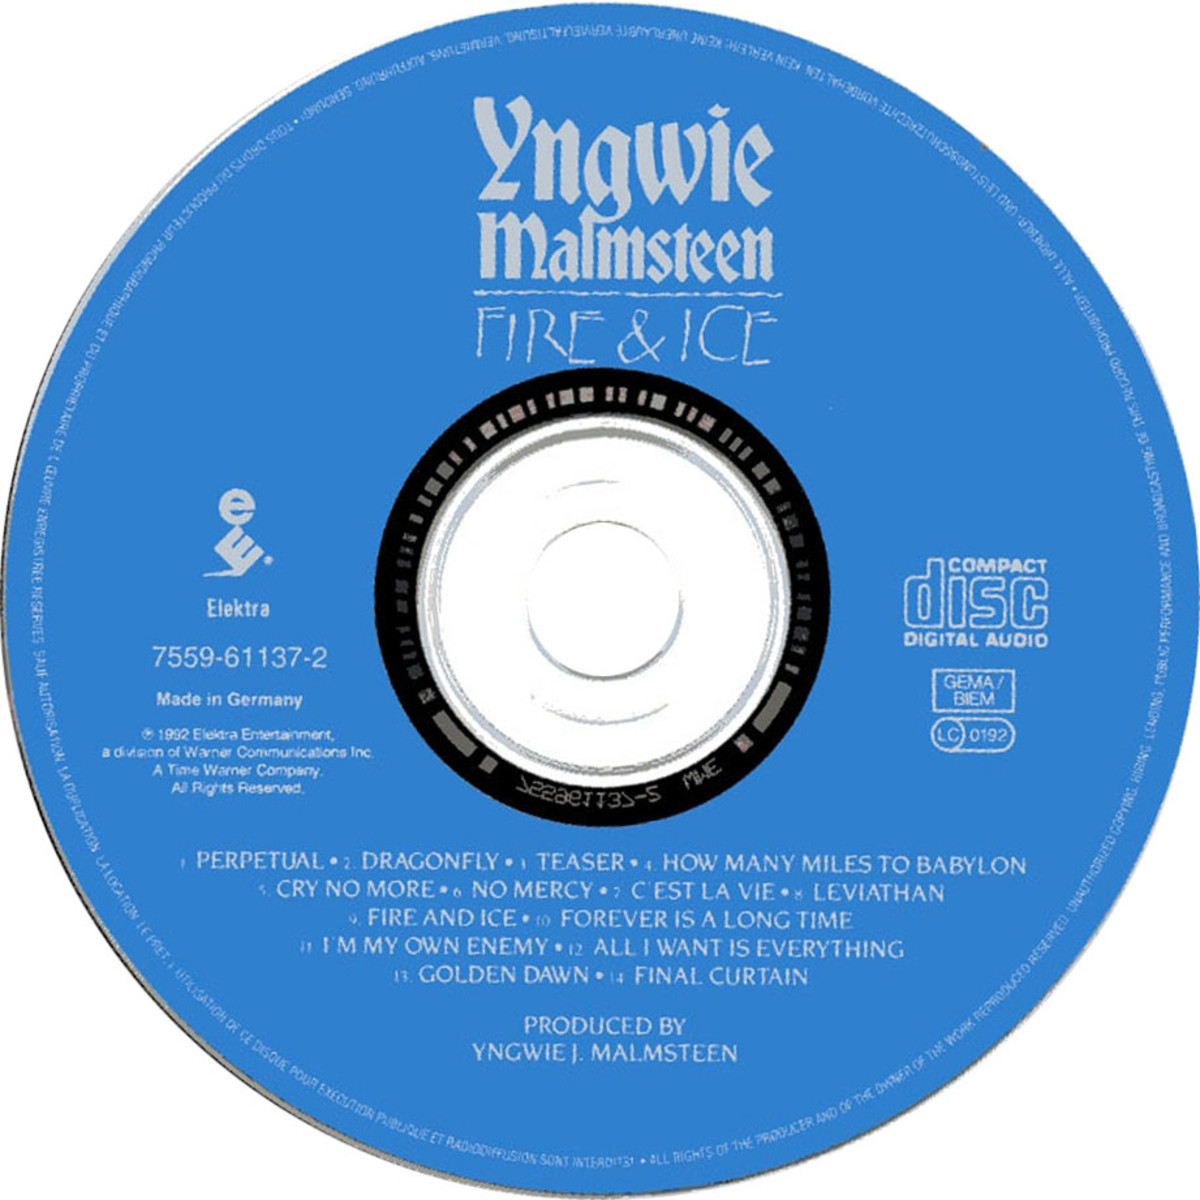 Swedish Guitarist Yngwie J. Malmsteen's